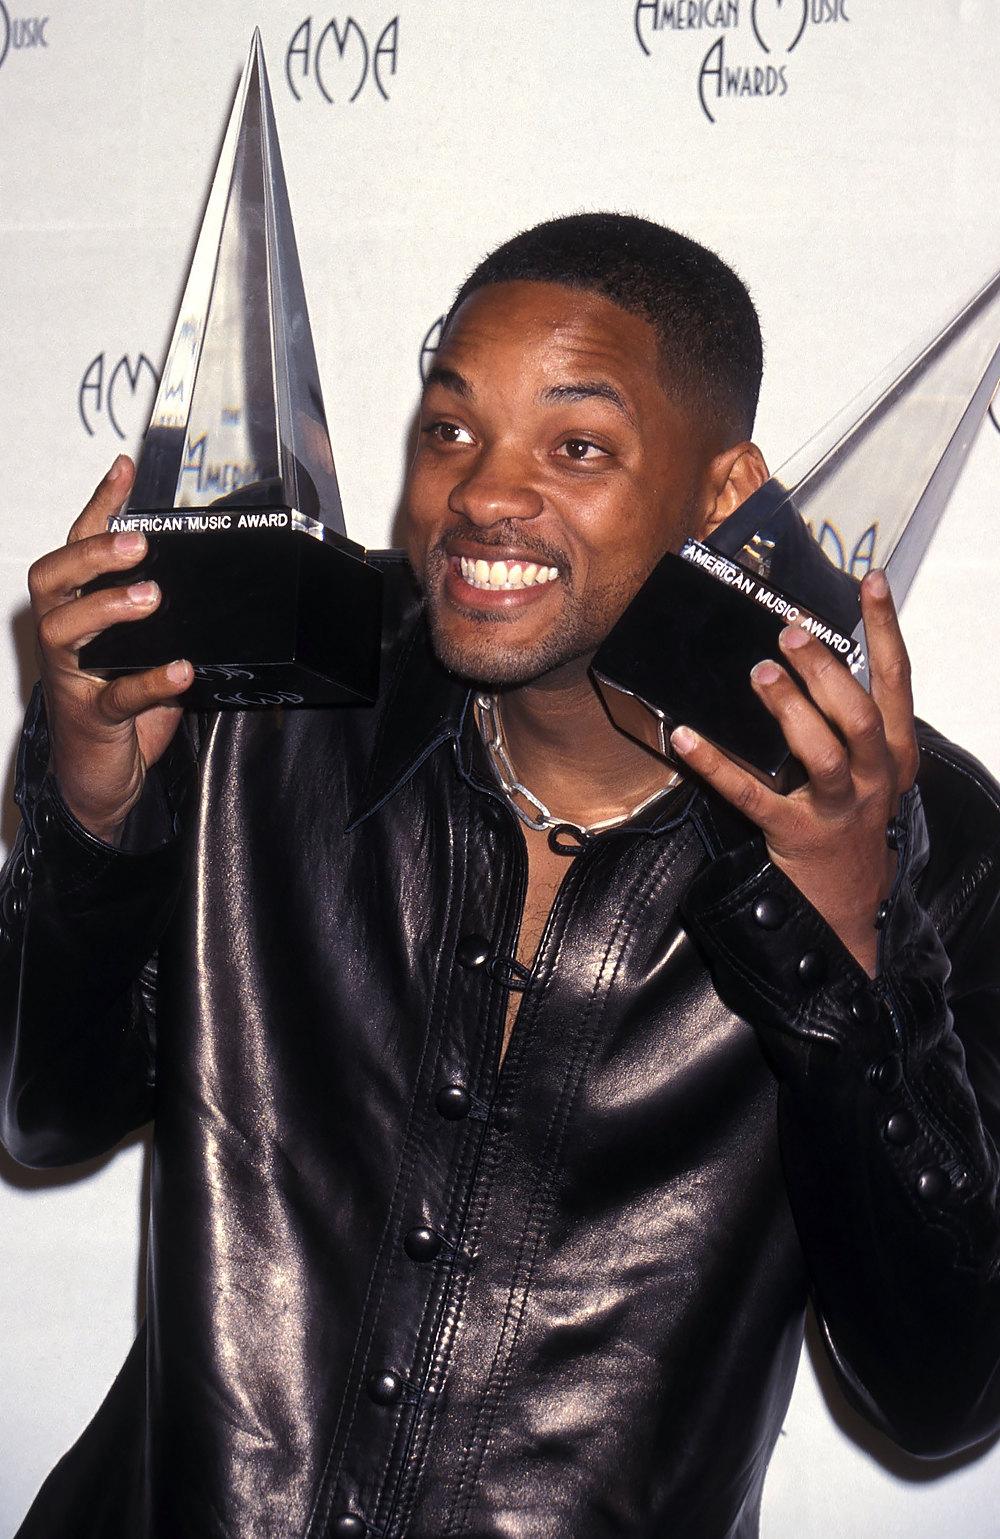 Уилл Смит наAmerican Music Awards, январь 1999